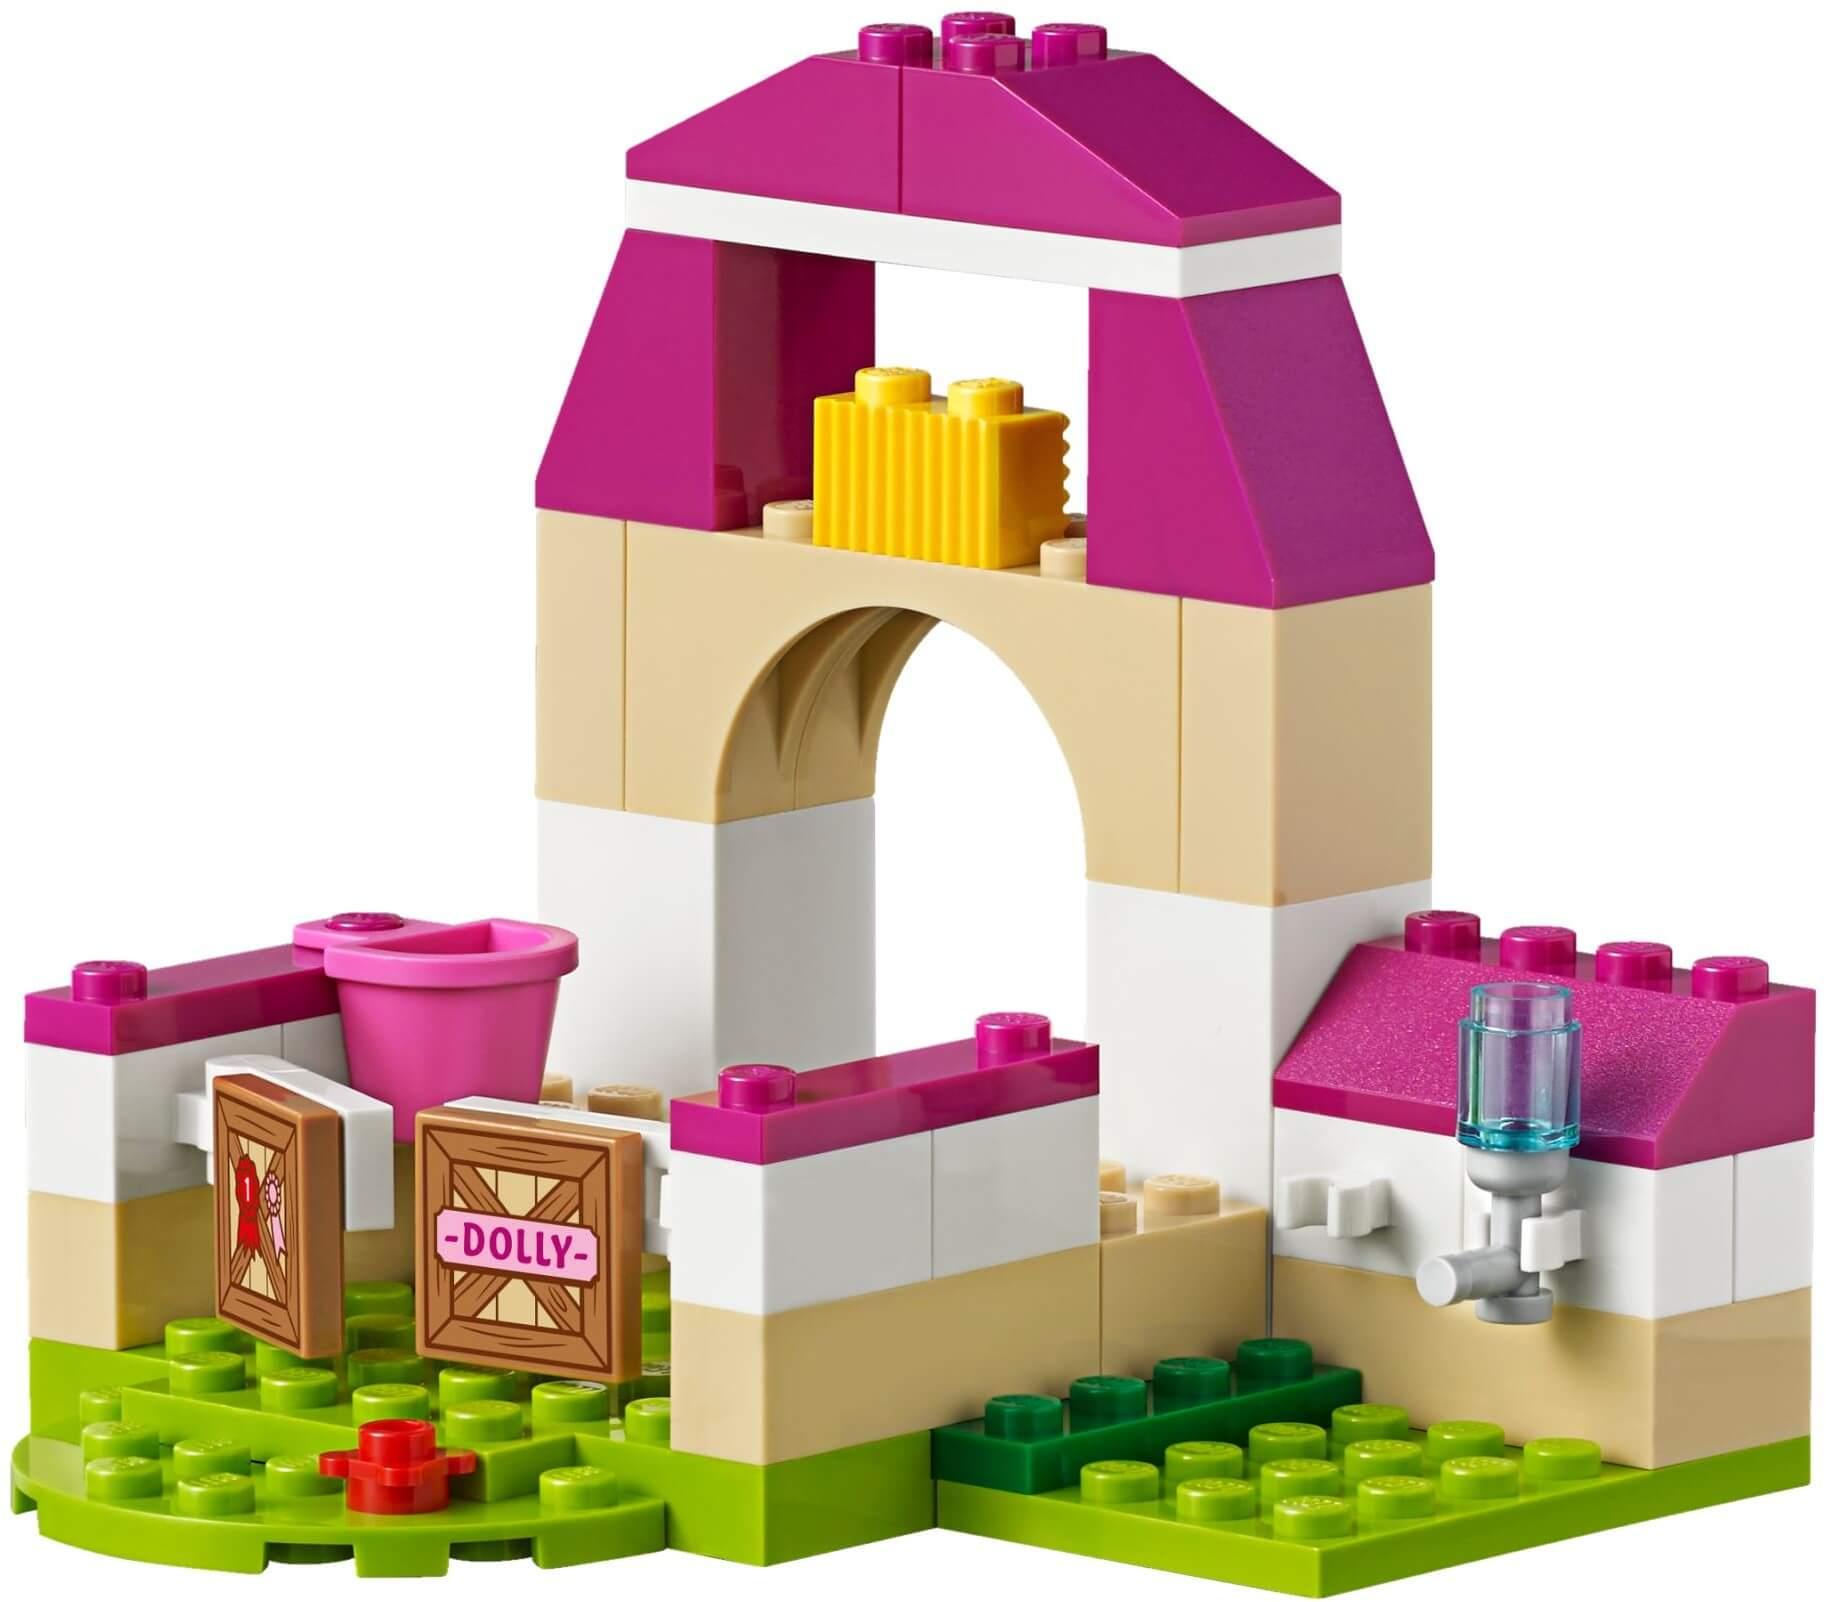 Mua đồ chơi LEGO 10746 - LEGO Juniors 10746 - Cặp Xách Nông Trại của Mia (LEGO 10746 Mia's Farm Suitcase)